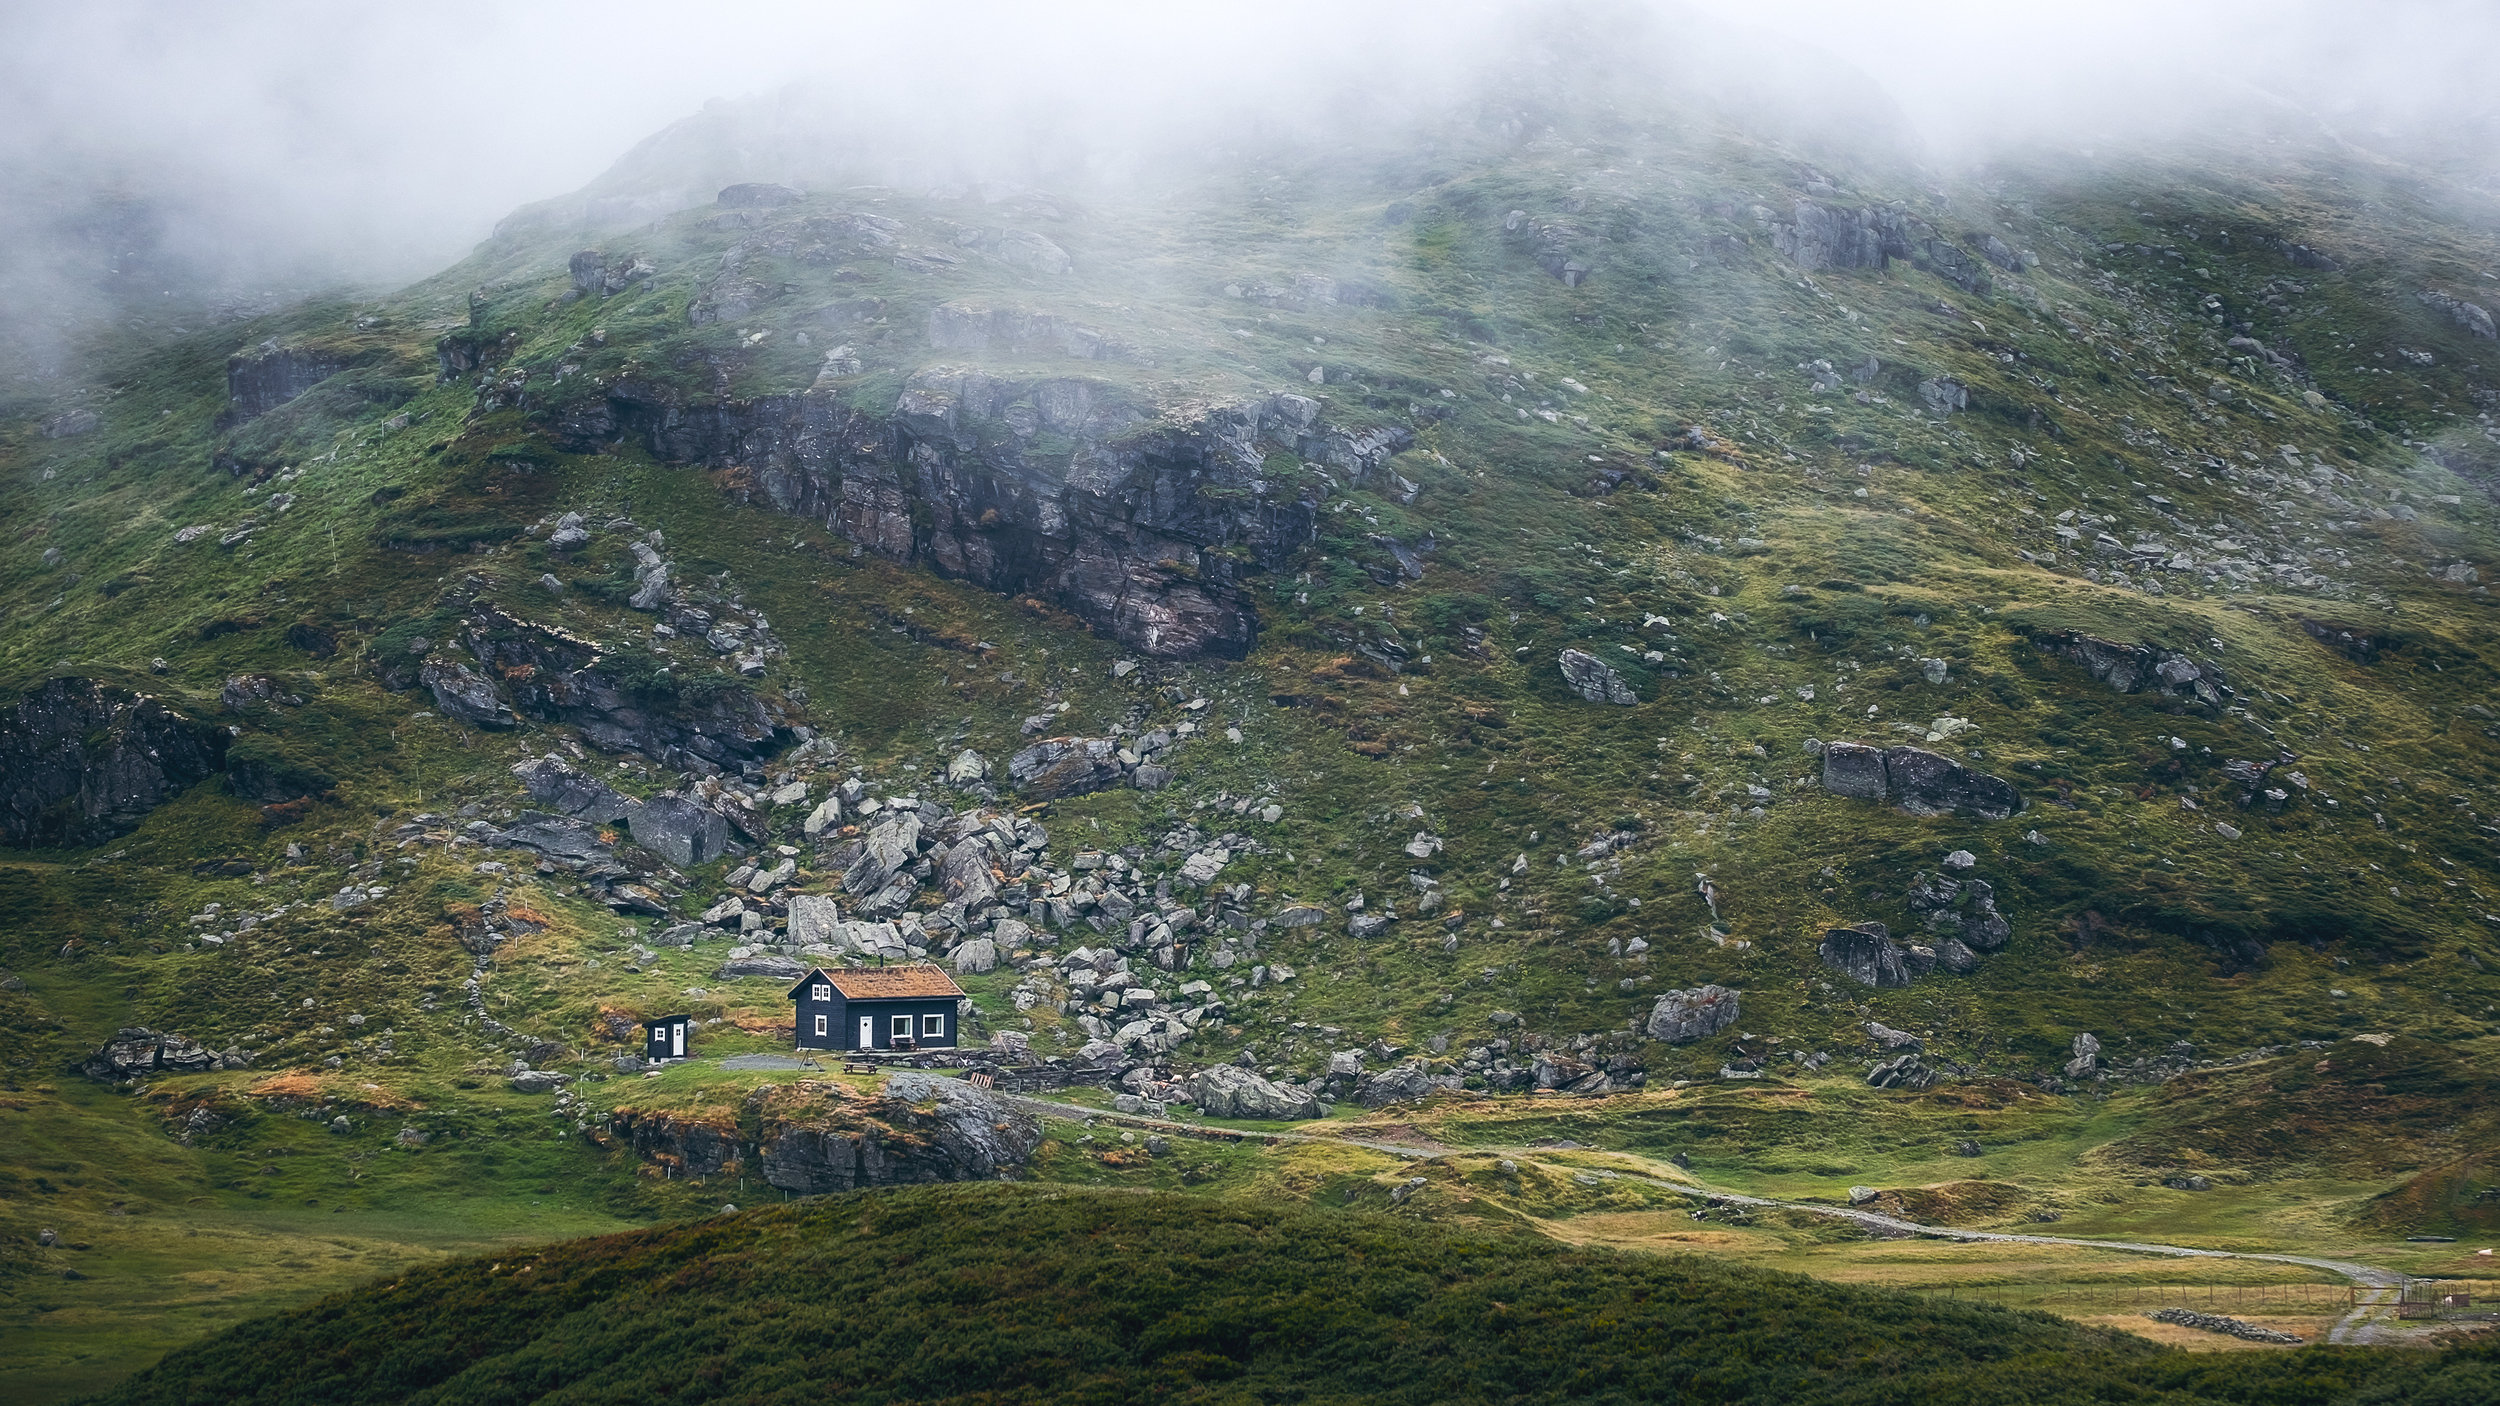 A Moutain cabin in Hordland Fylke near Svandalsflona tunnel entrance